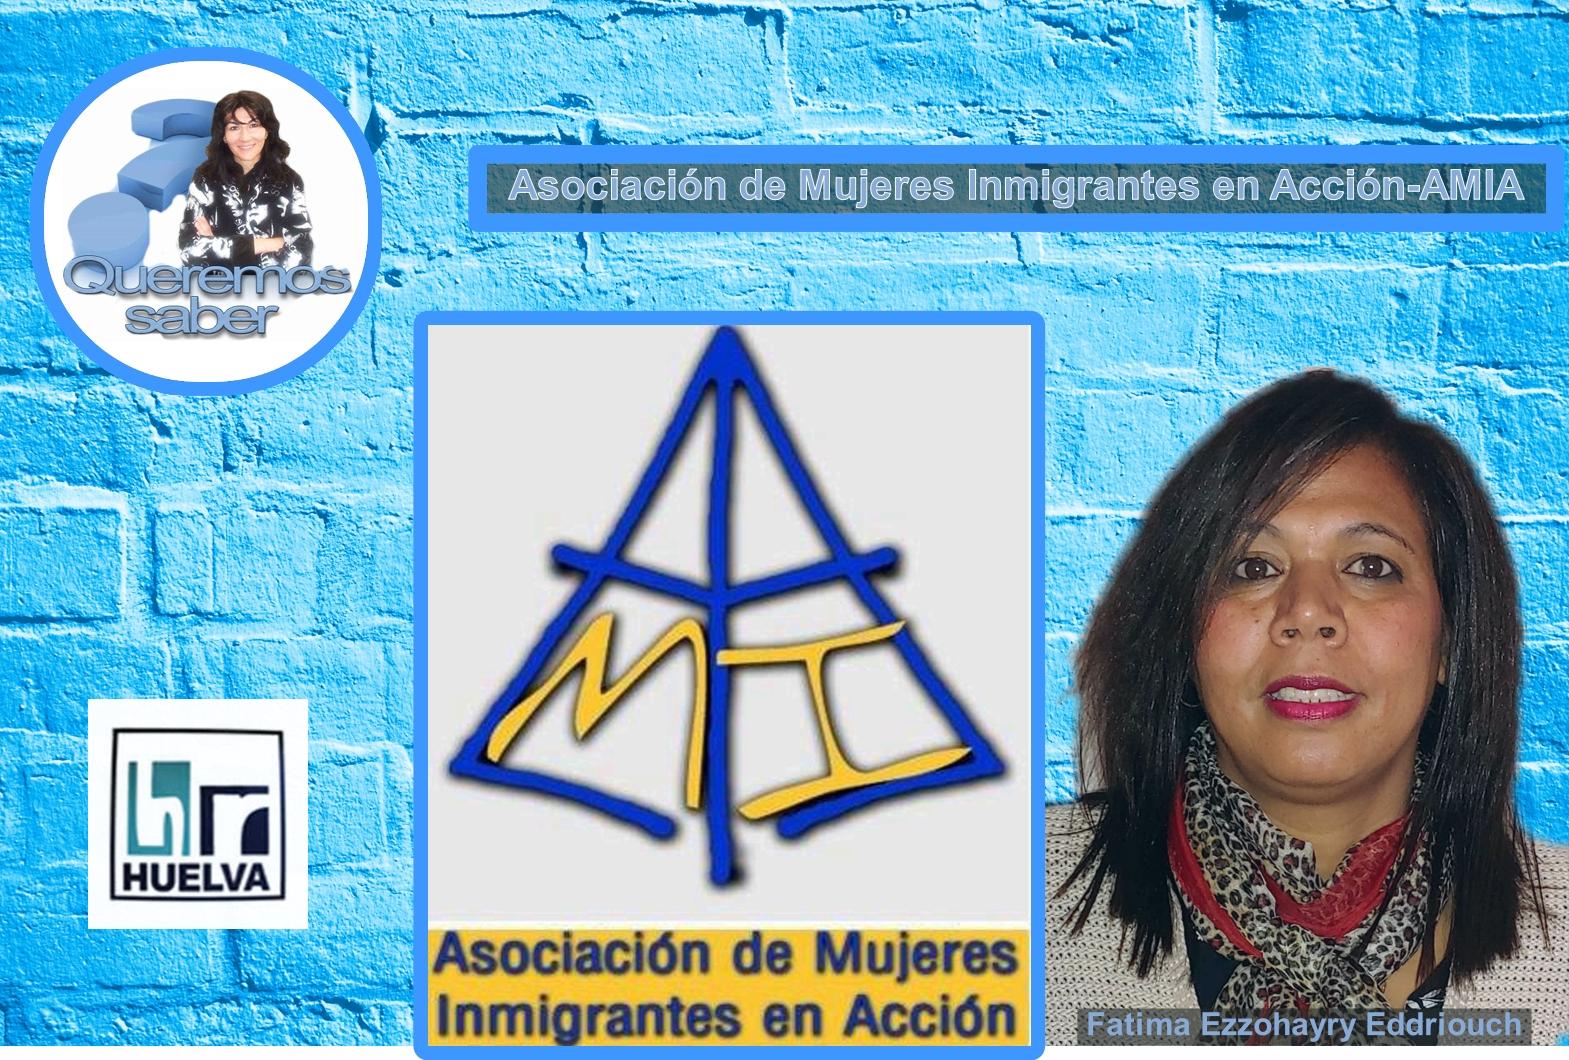 Queremos Saber 16-06-2020 Asociación de Mujeres Inmigrantes en Acción-AMIA